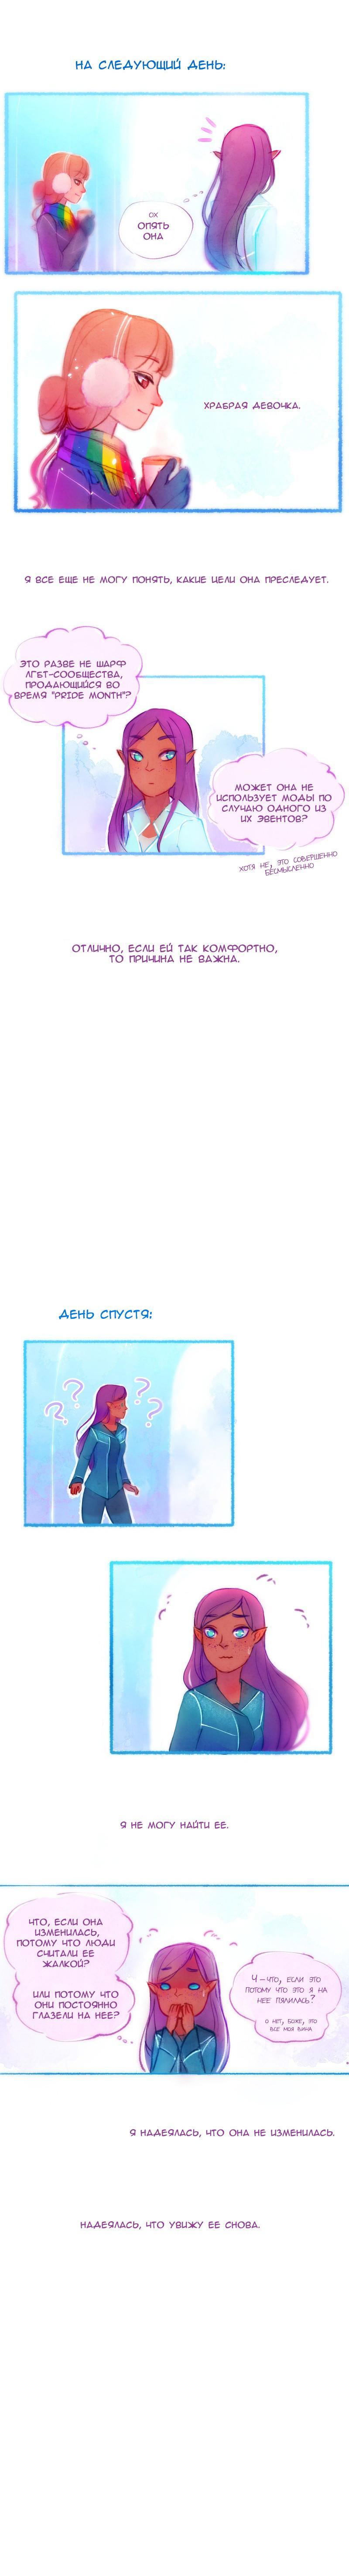 https://r1.ninemanga.com/comics/pic2/31/32415/322850/1492185939488.jpg Page 2